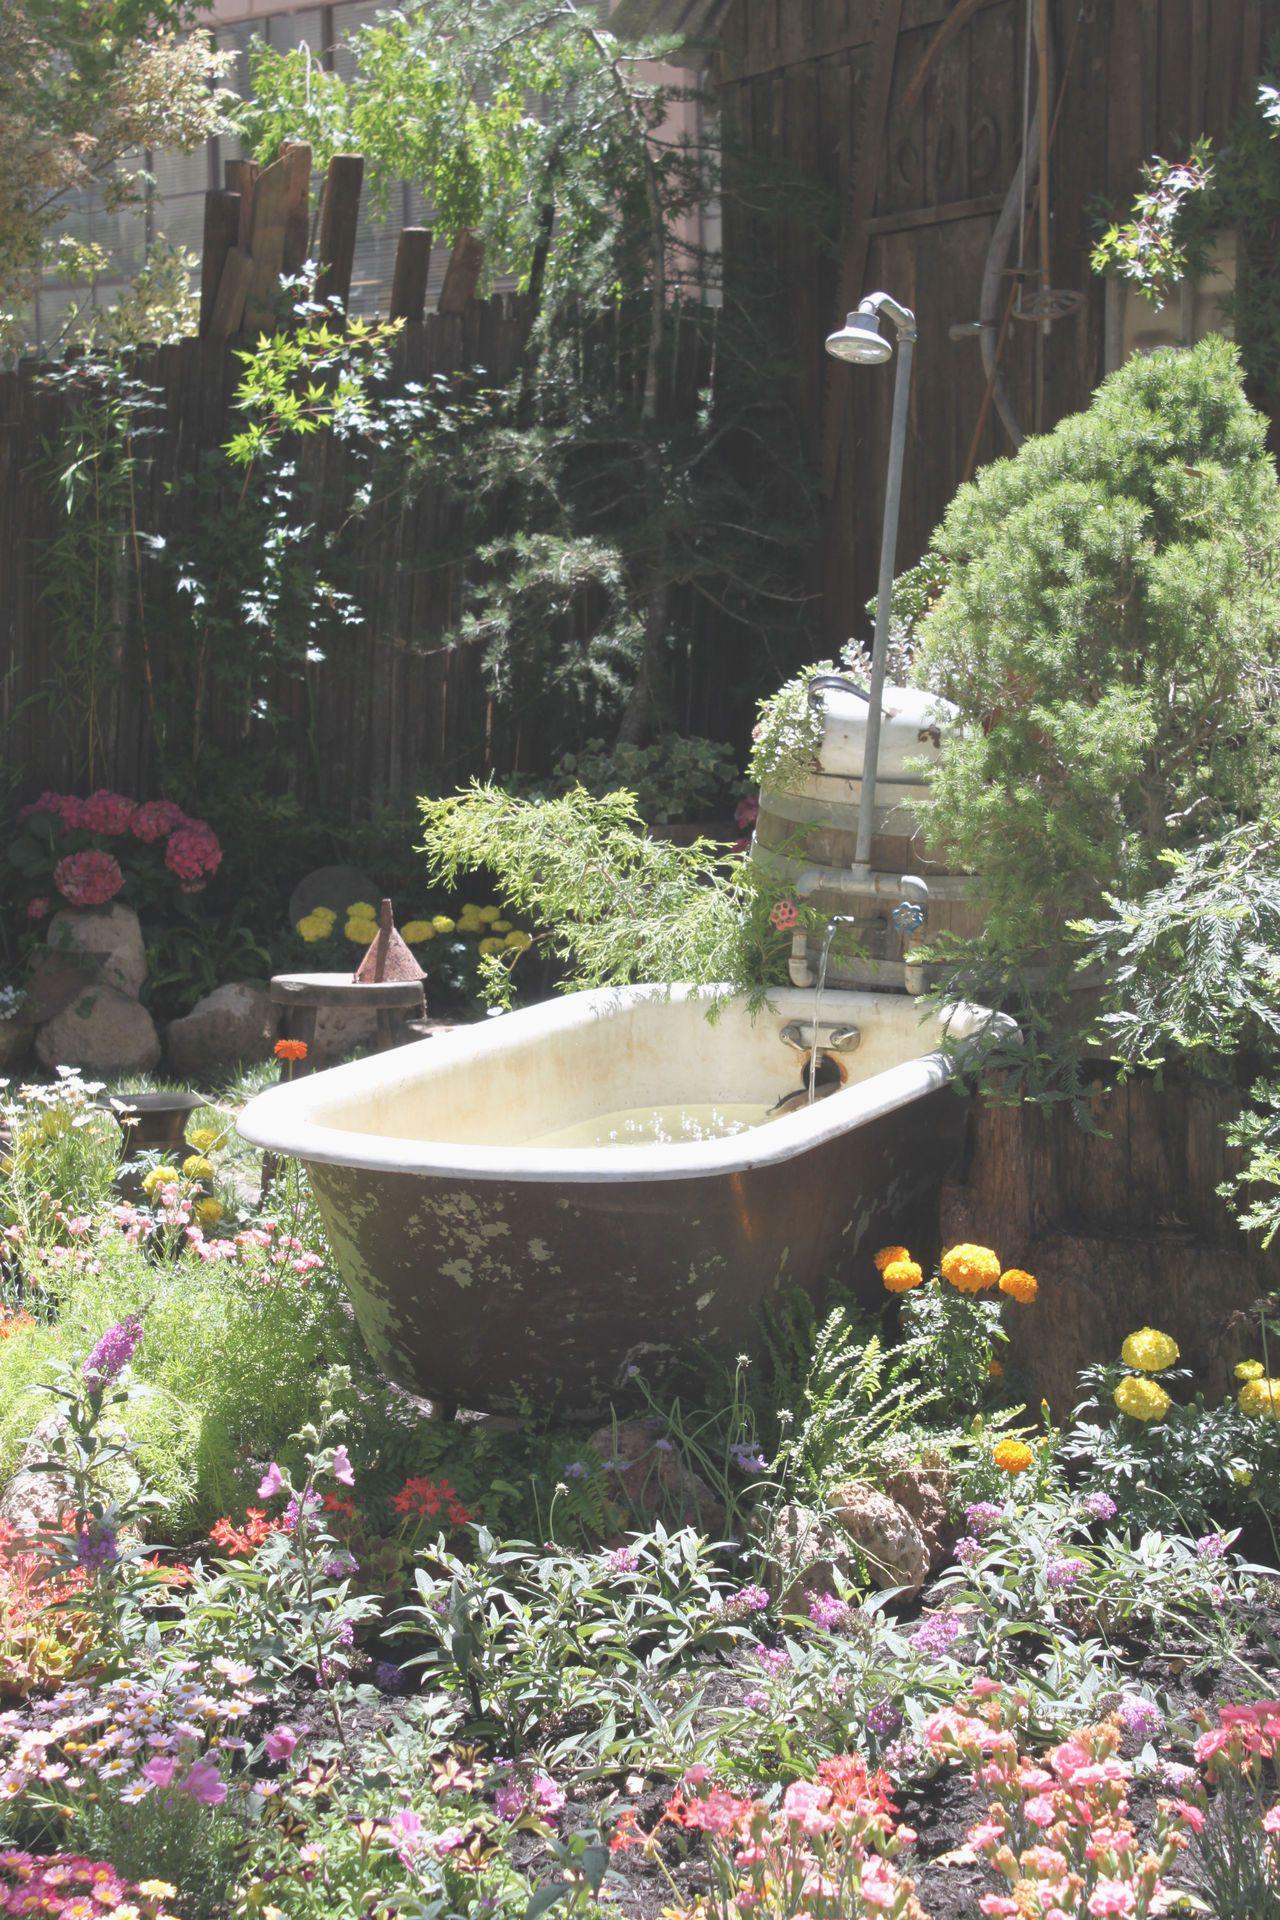 a lovely outdoor bath